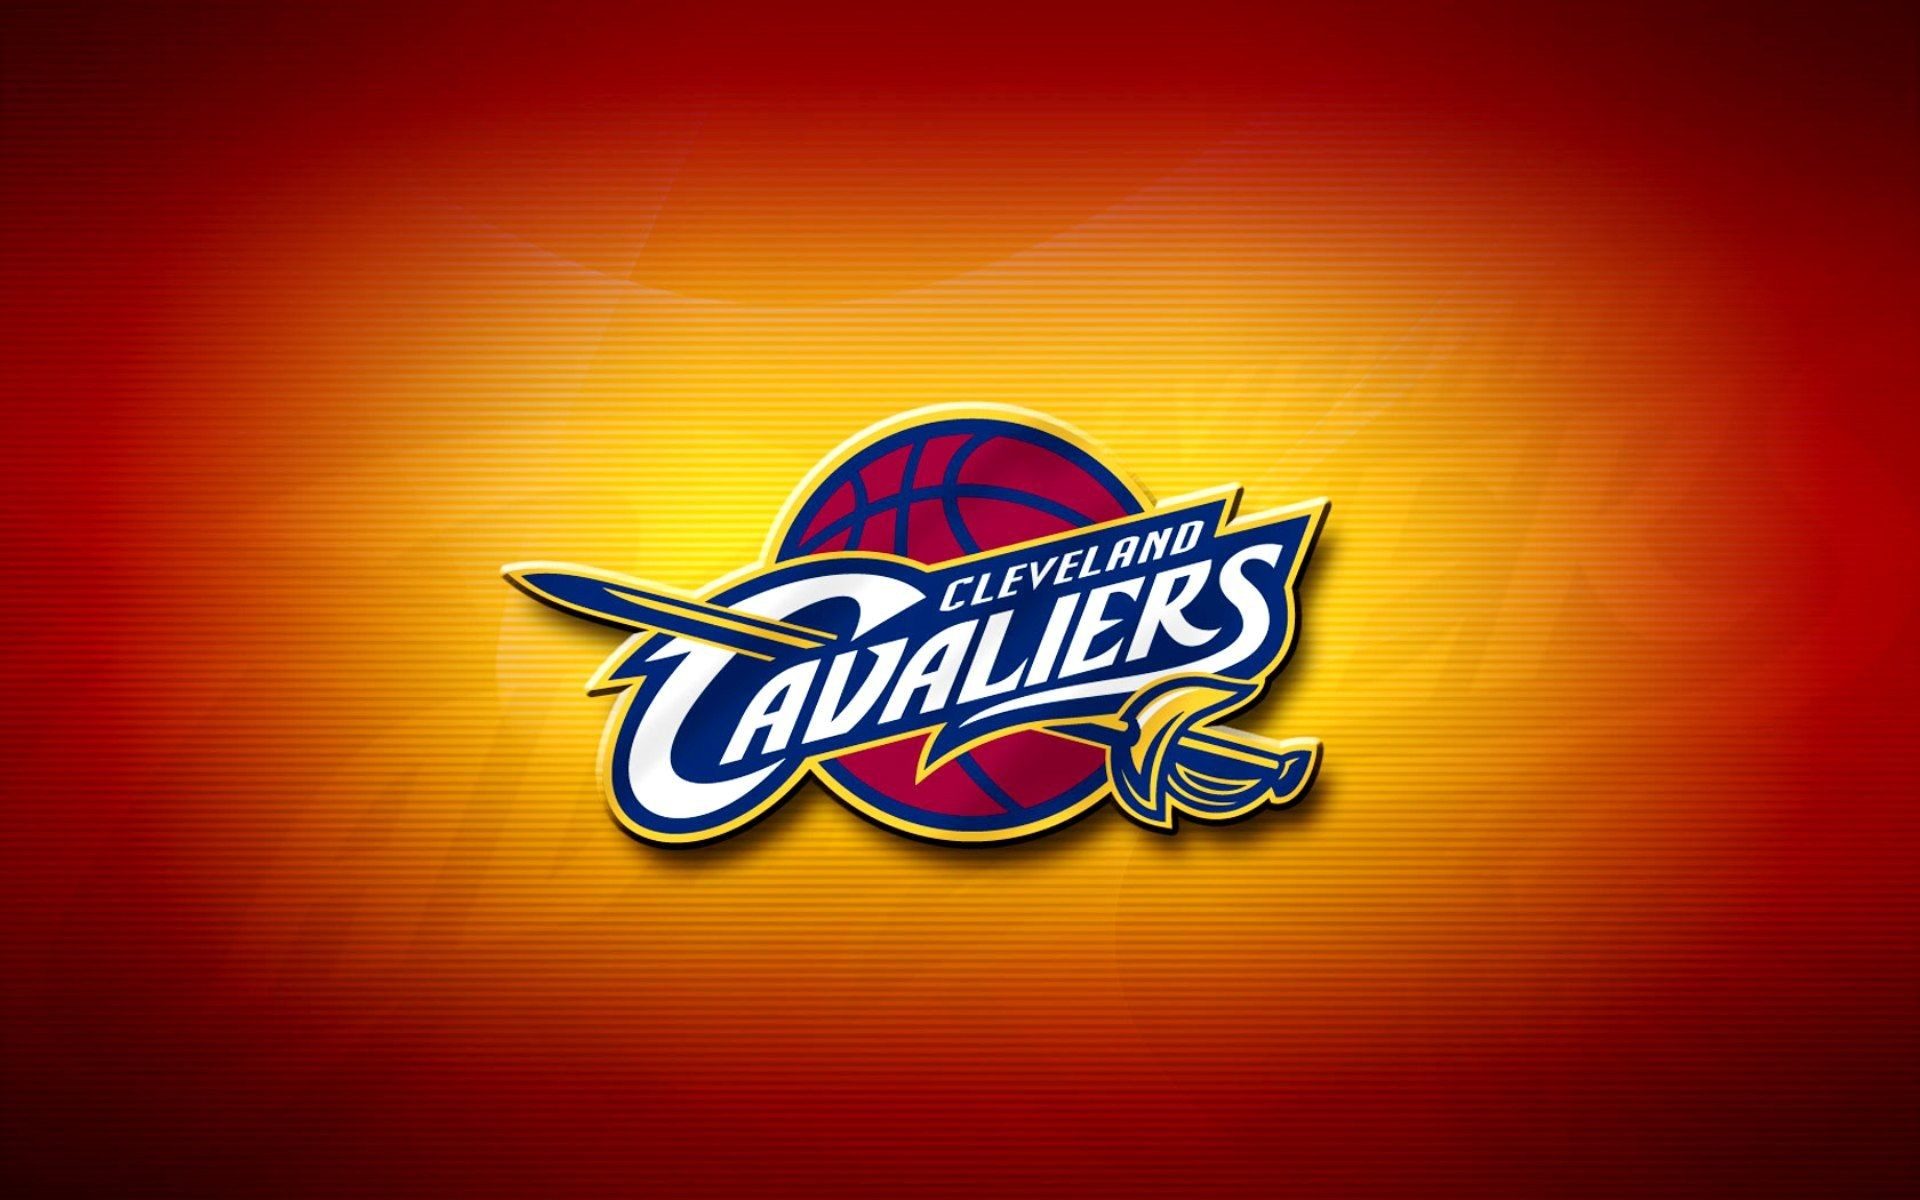 1920x1200 Cleveland Cavaliers Logo Wallpaper Basketball Team